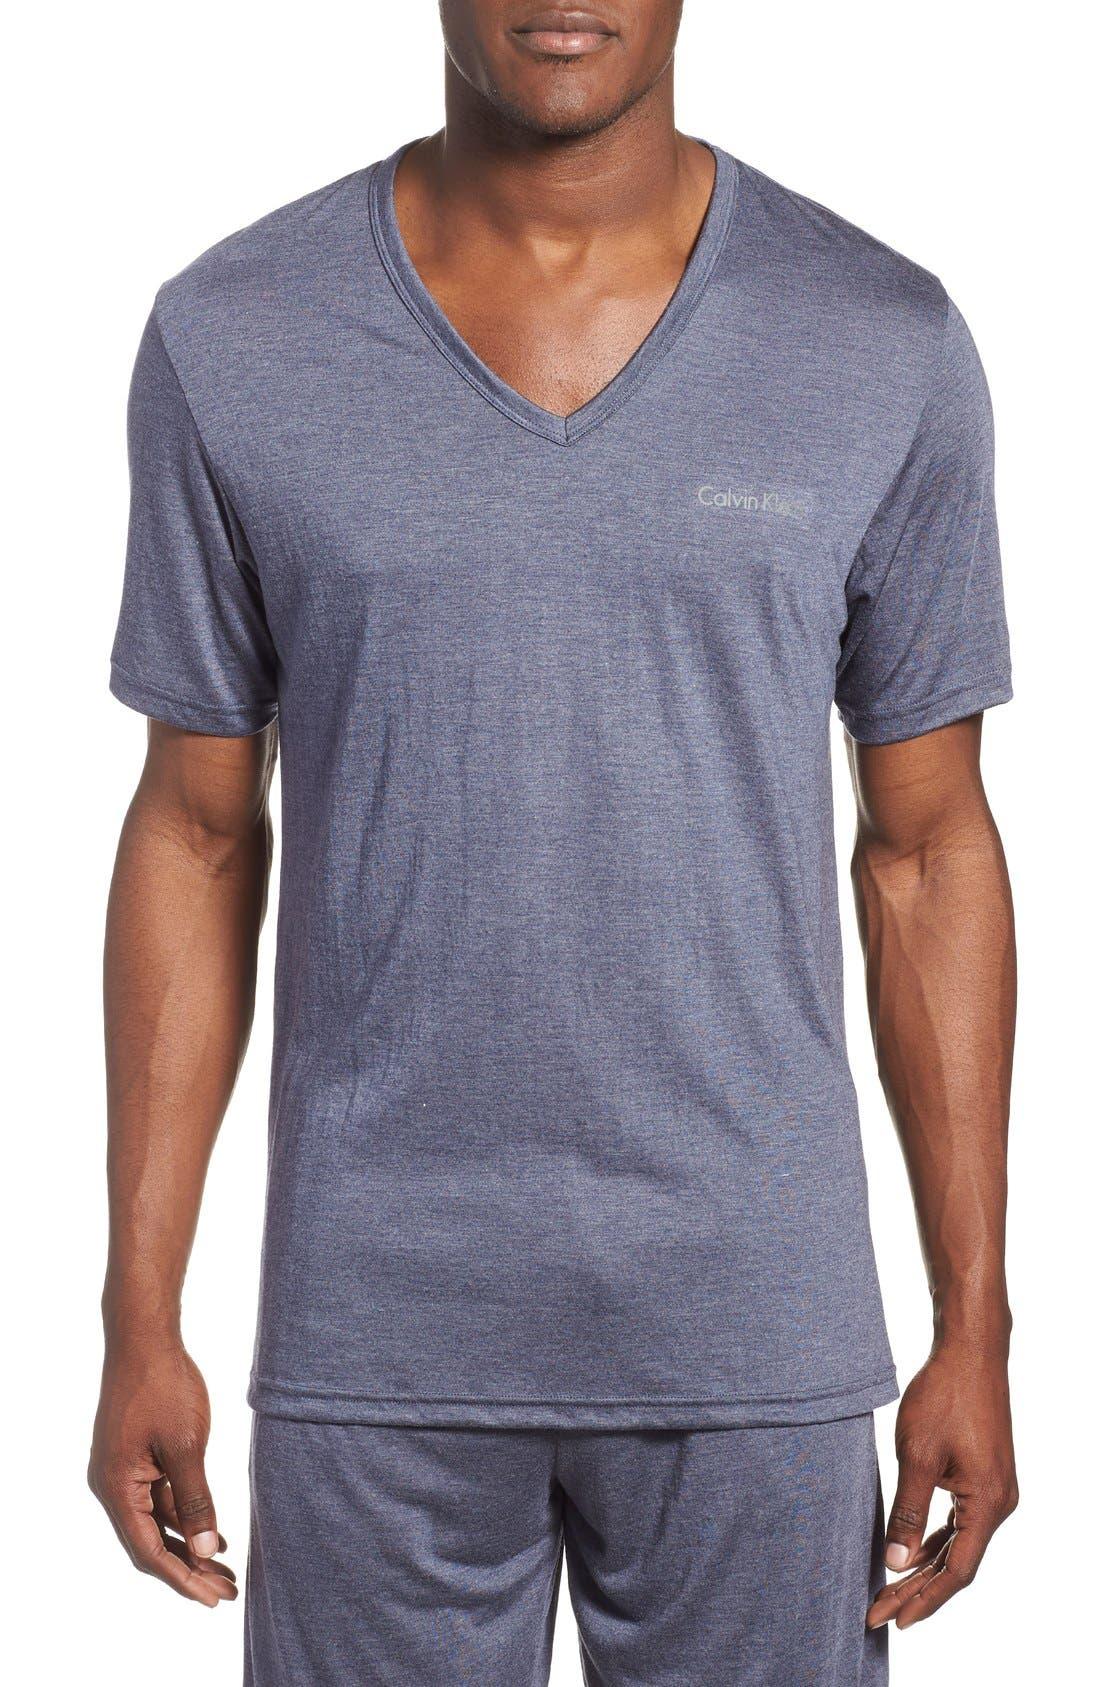 Main Image - Calvin Klein 'Liquid Lounge' V-Neck T-Shirt